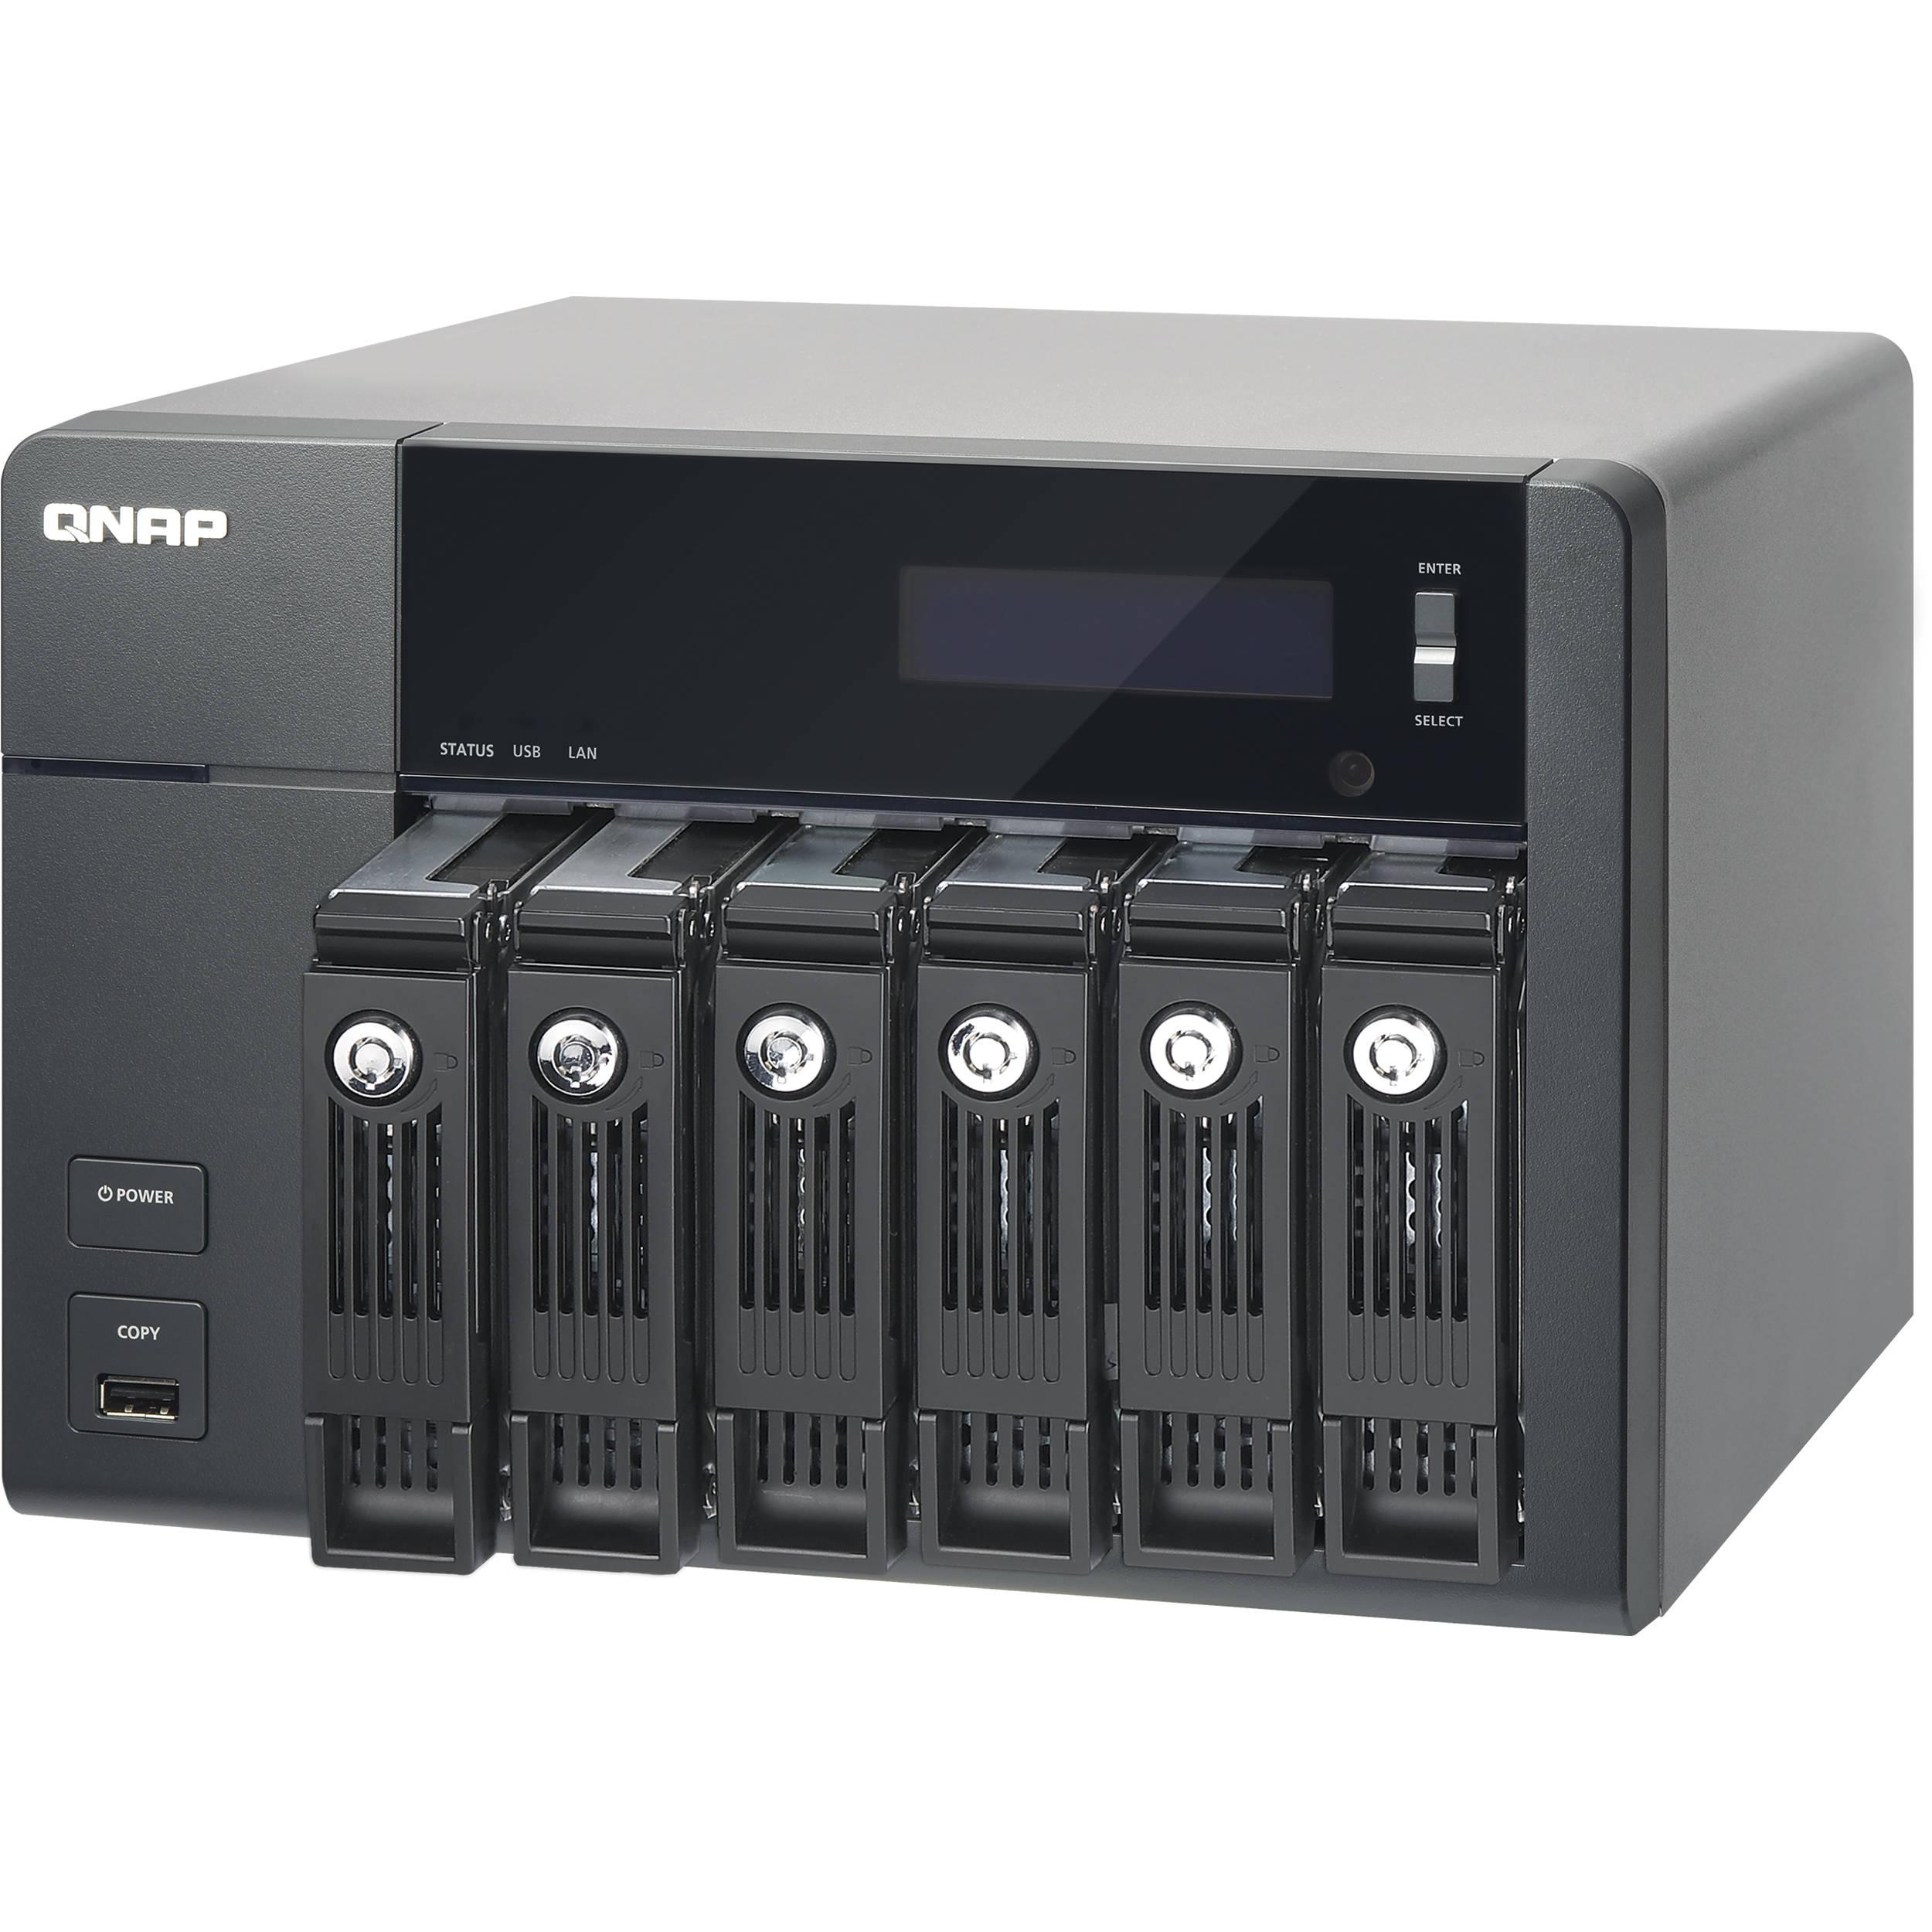 QNAP TS-670 6-Bay High Performance NAS for SMB